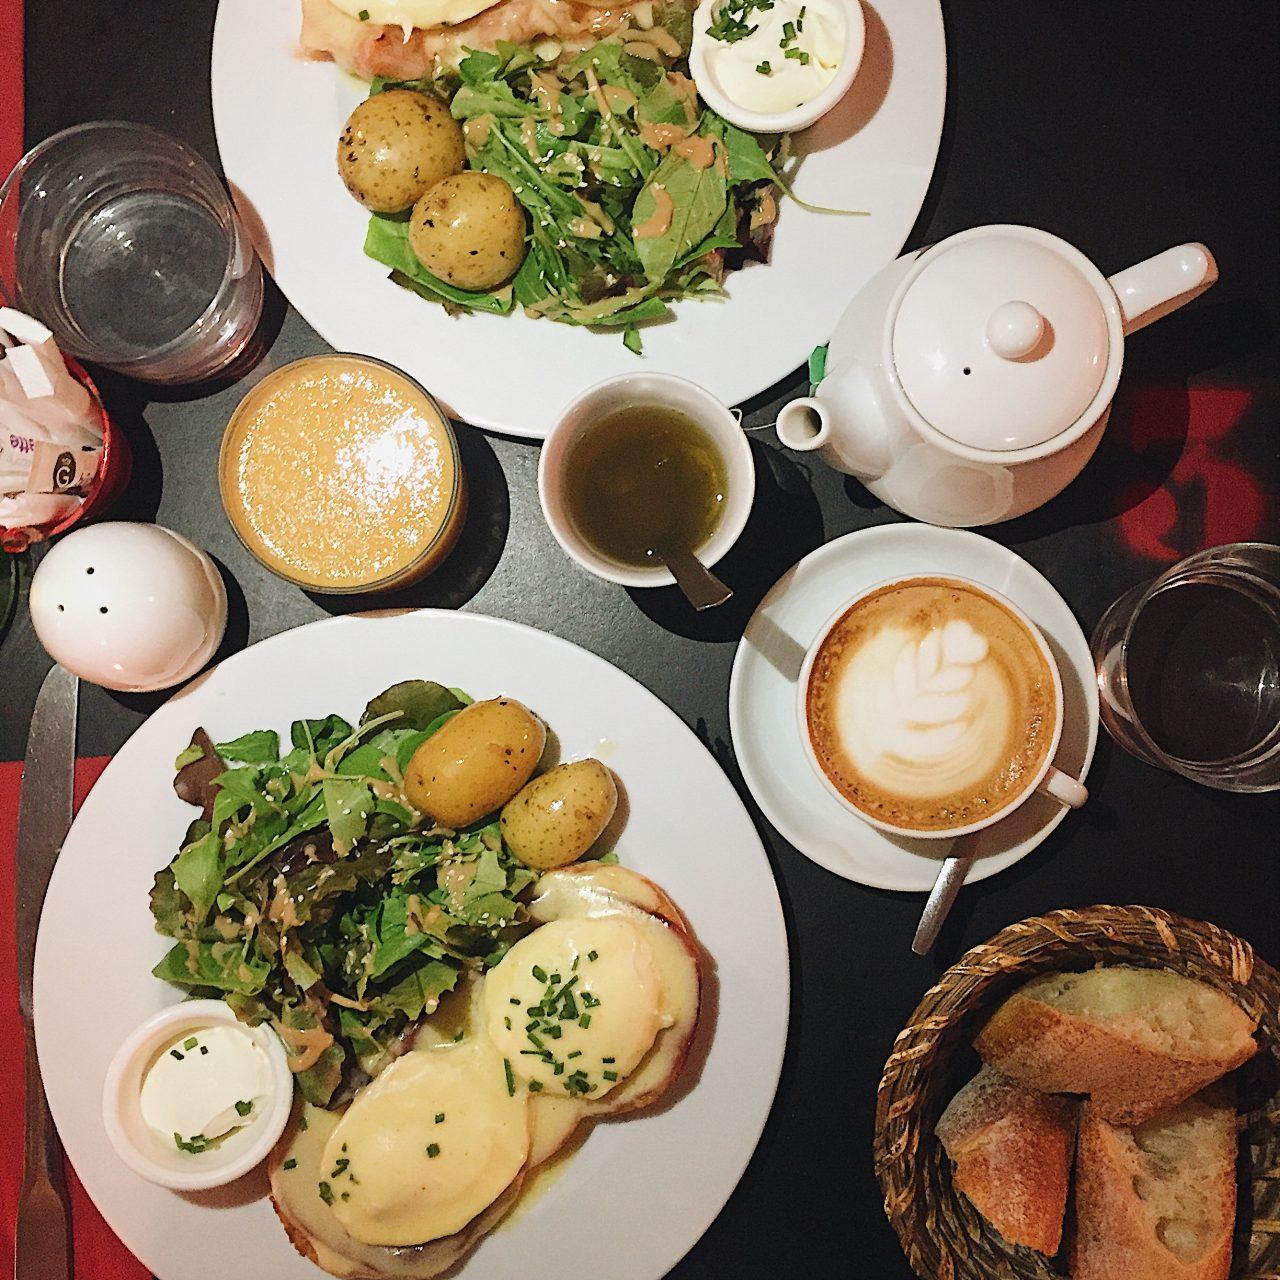 34B1A810-9BC0-49D8-BC5D-6556BC78D2F3-1280x1280 Best spots for BRUNCH in Paris! Blog  best brucnh paris breakfast paris brunch paris discover paris eat paris food paris Paris top brunch paris travel paris trend paris